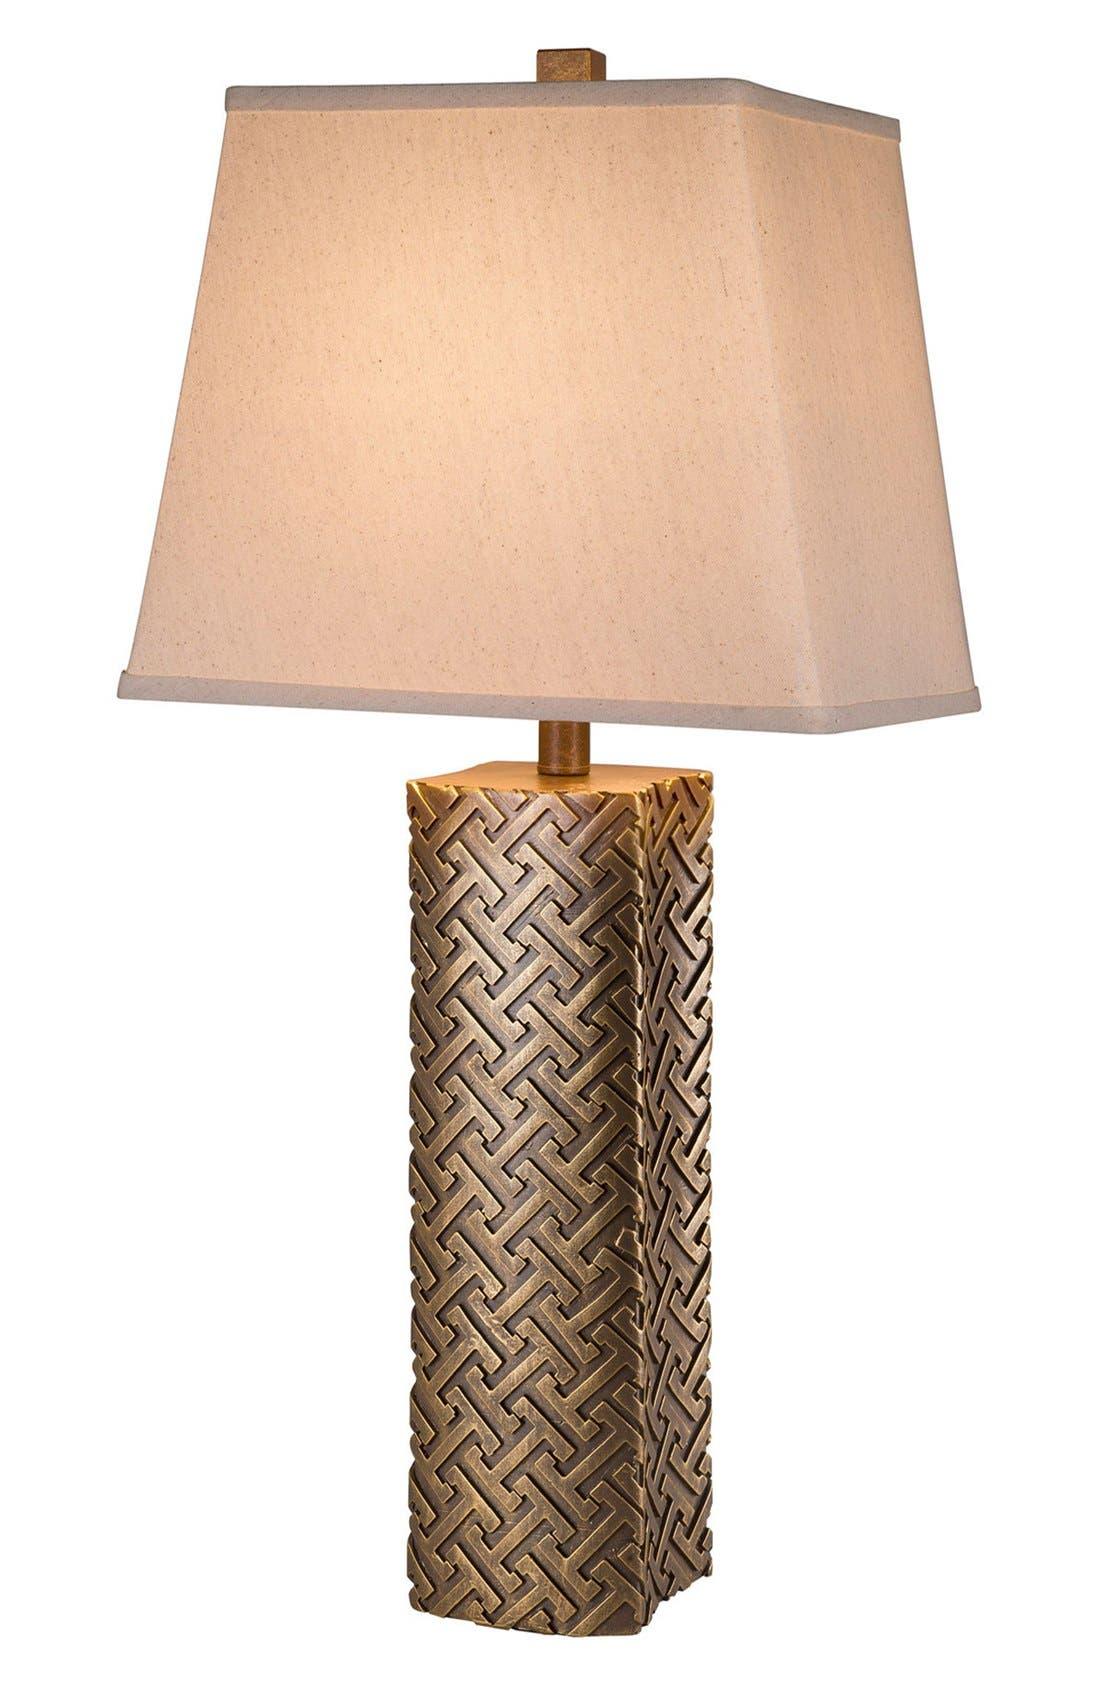 Alternate Image 1 Selected - JAlexander Geometric Metallic Table Lamp